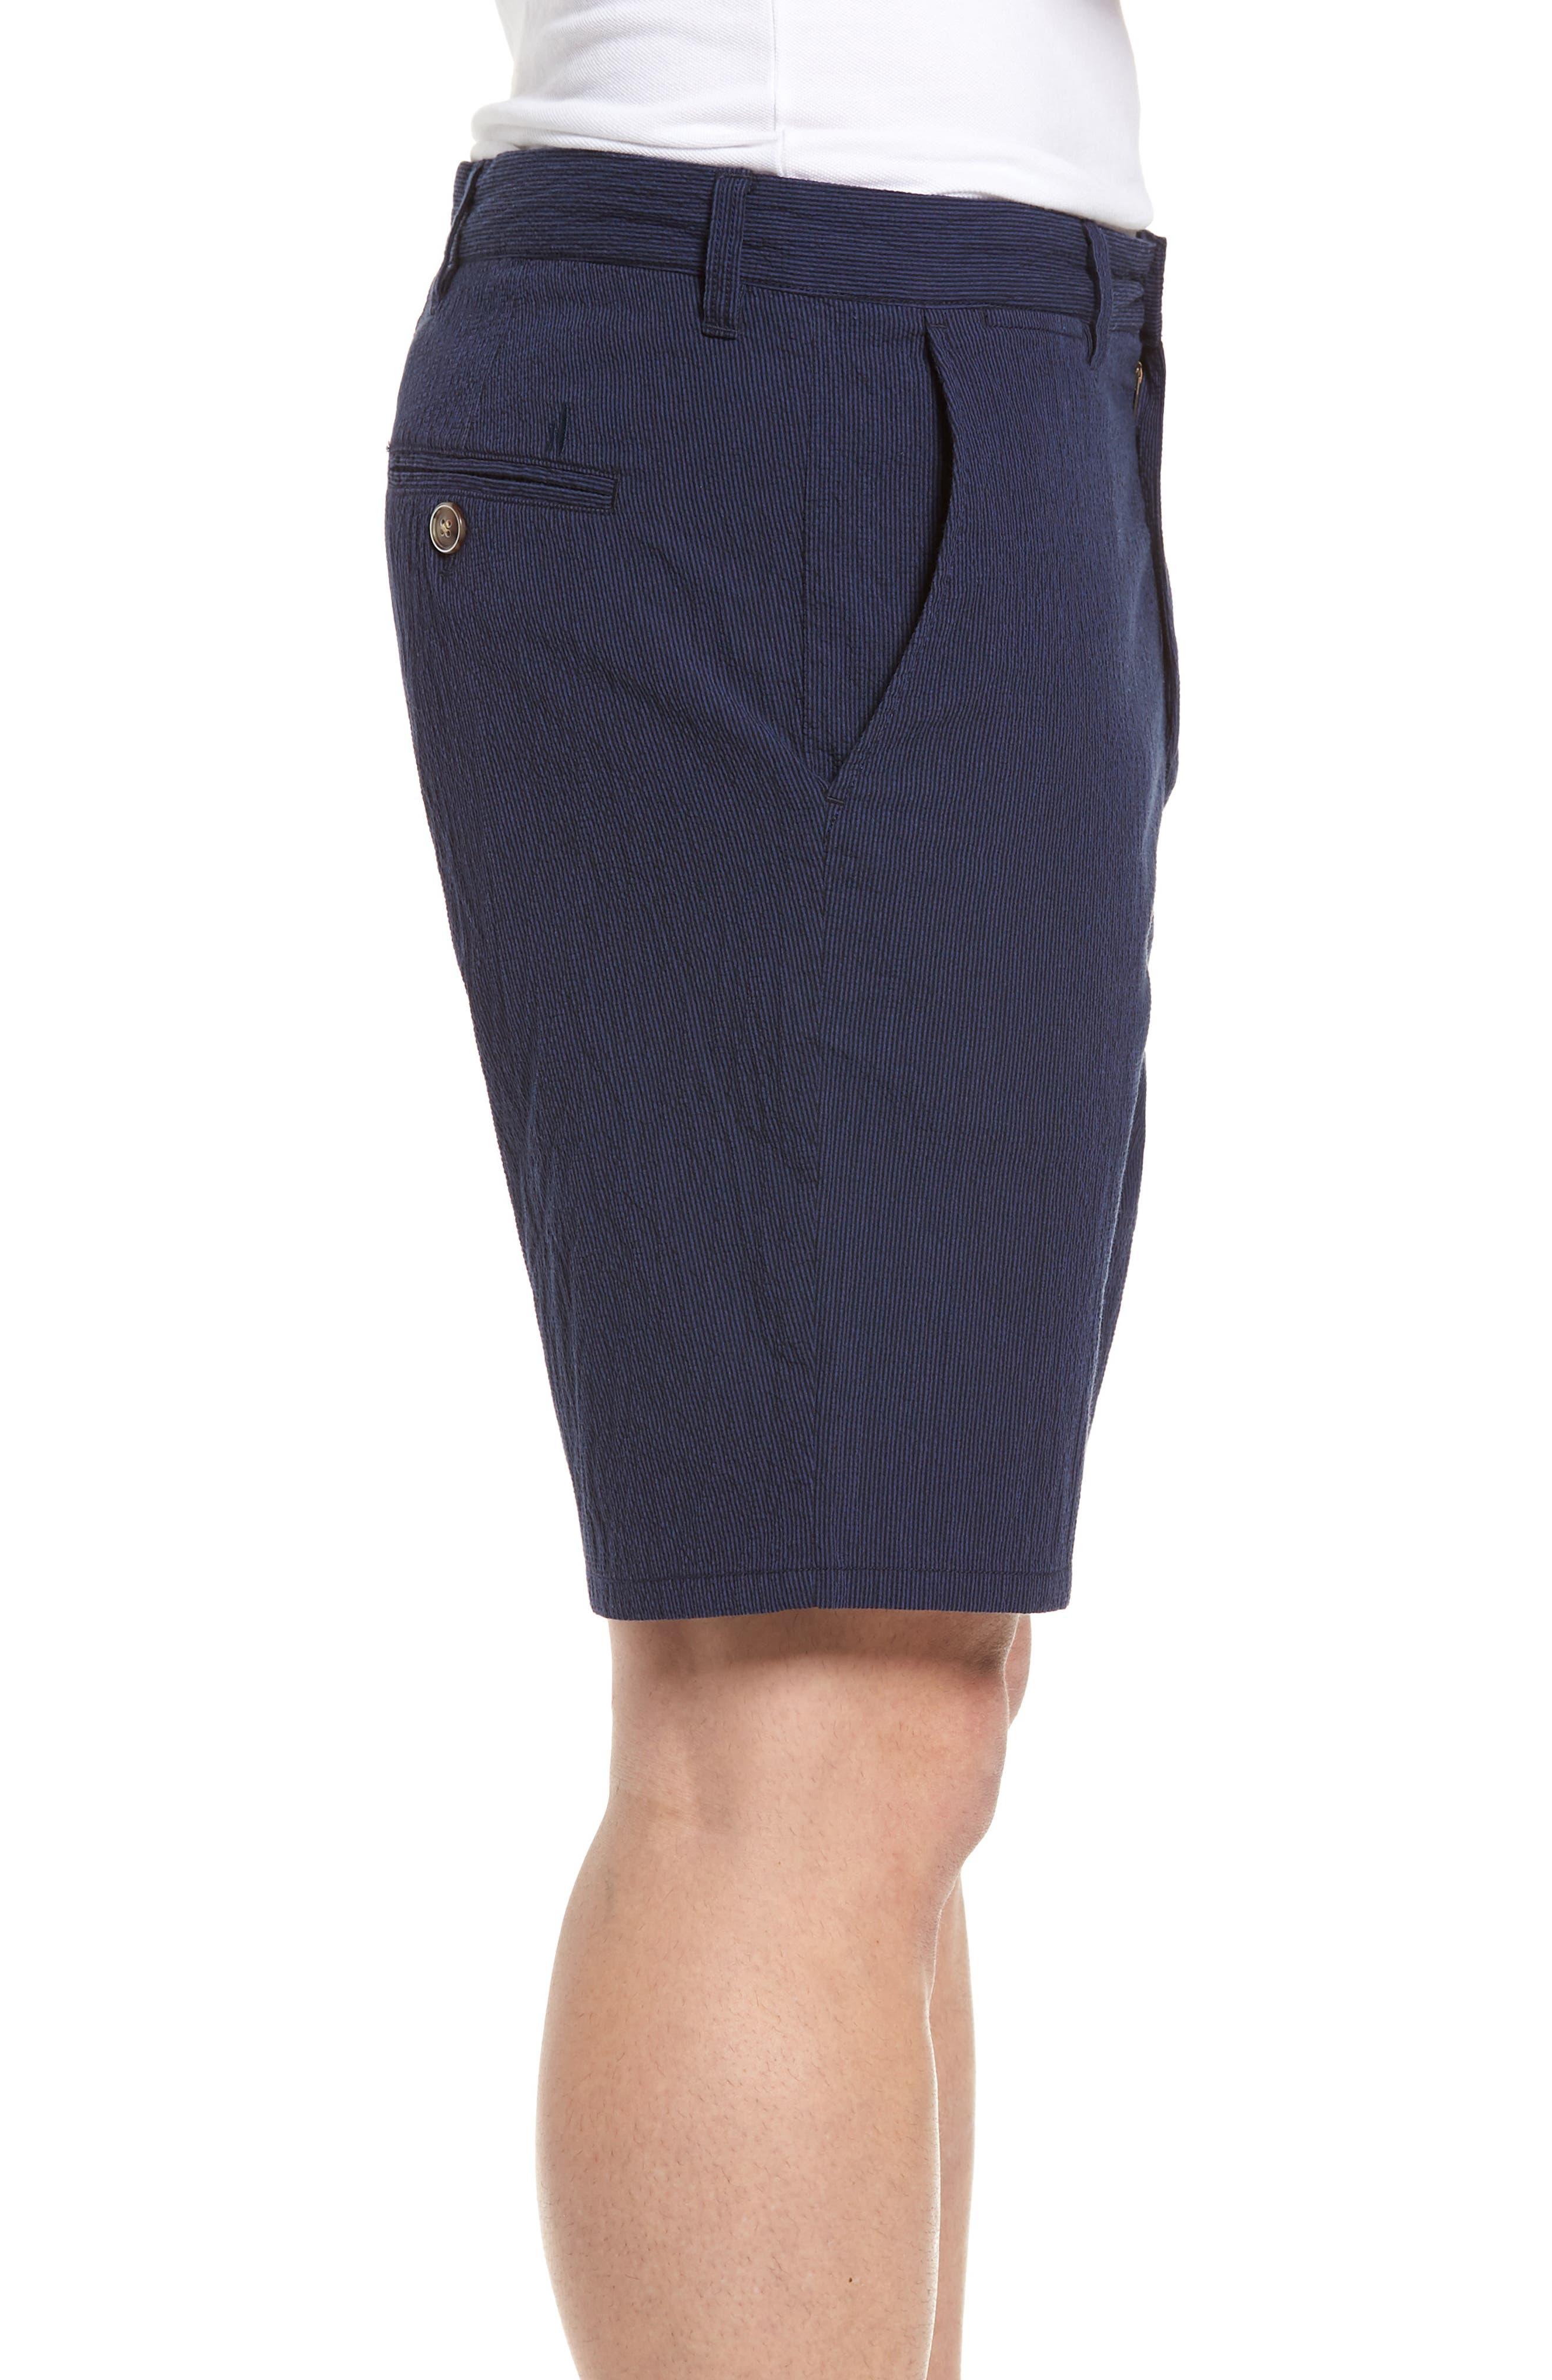 Bryson Regular Fit Shorts,                             Alternate thumbnail 3, color,                             Ripple